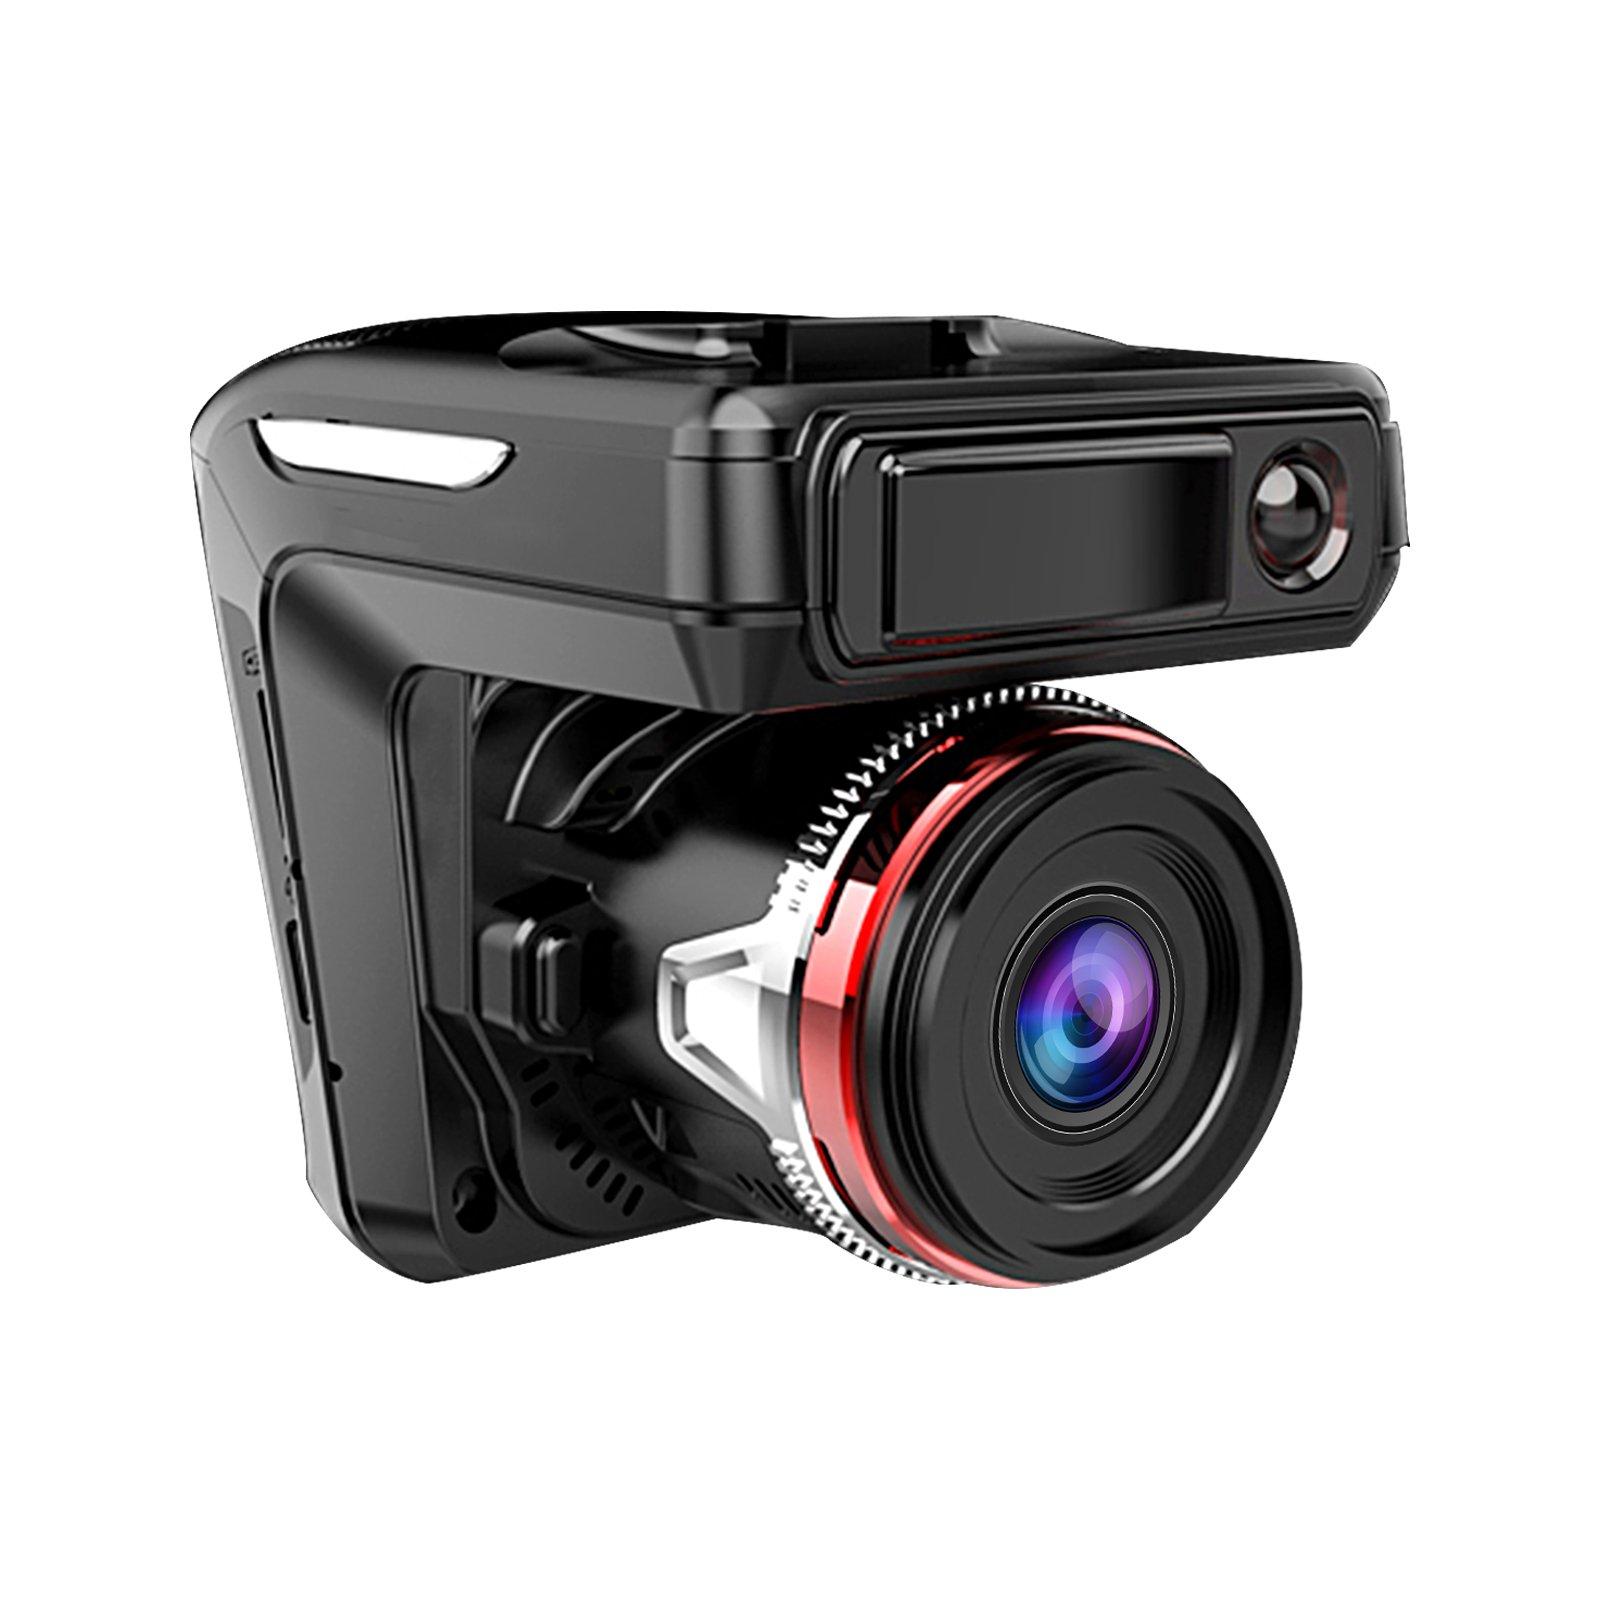 EEEKit 2in1 HD 1080P Car DVR Detector Camera Video Recorder Dash Laser Speed Cam Radar 170° Ultra High-Definition Wide Angle Lens Night Vision G-Sensor 1080P